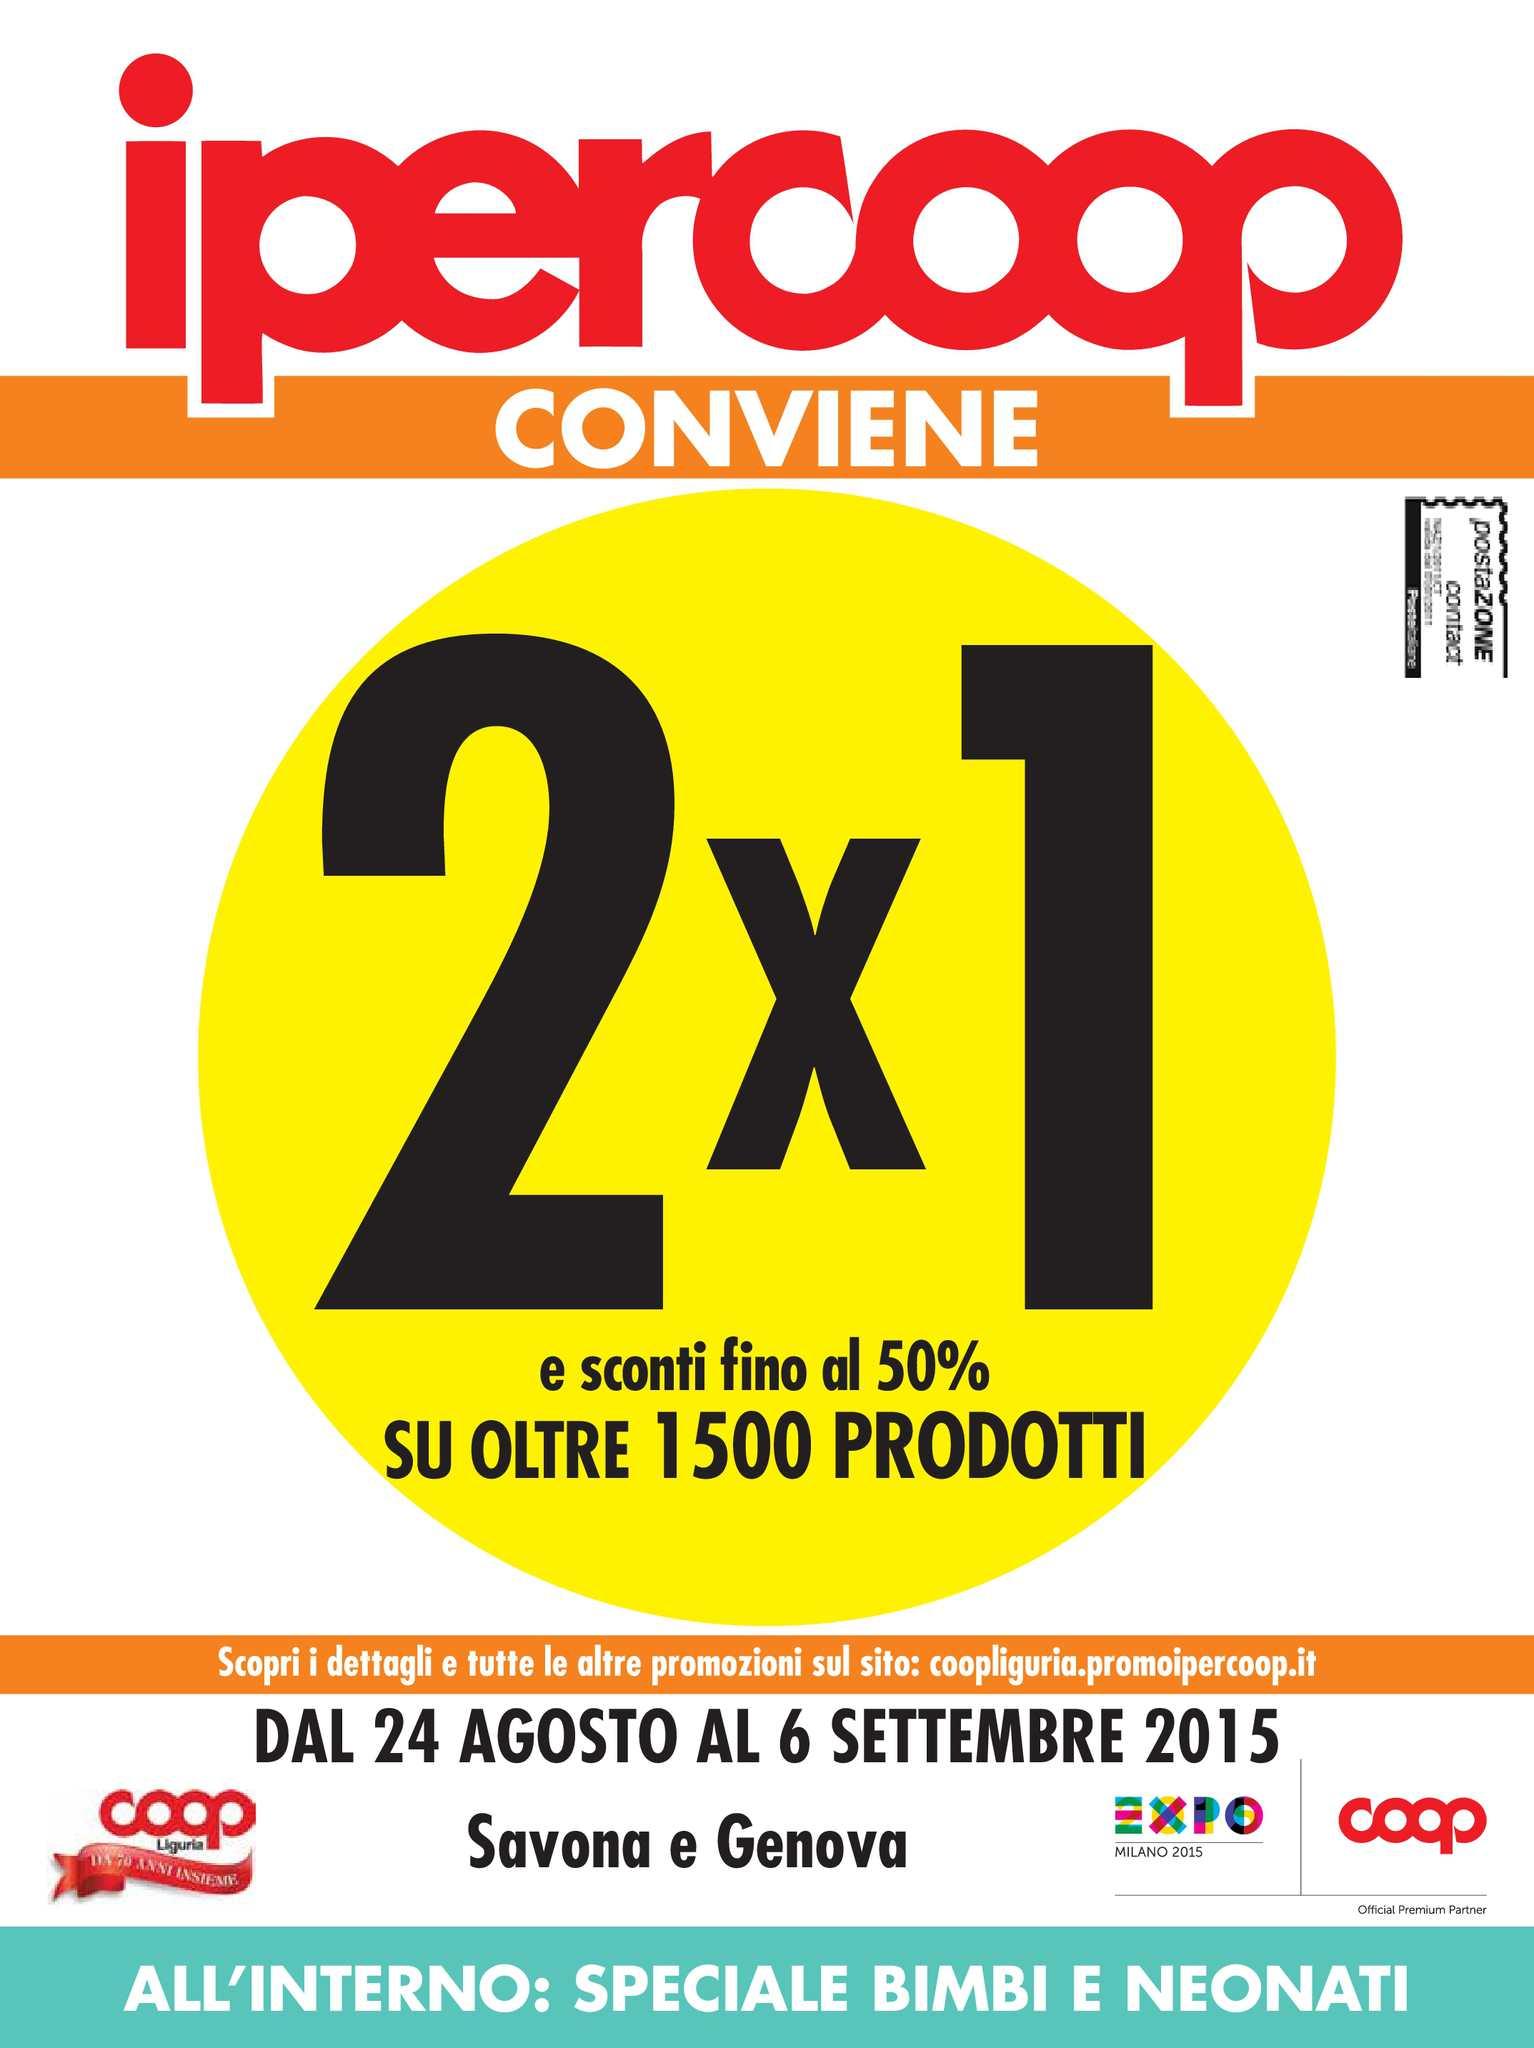 Best Ipercoop La Spezia Le Terrazze Images - Idee Arredamento Casa ...